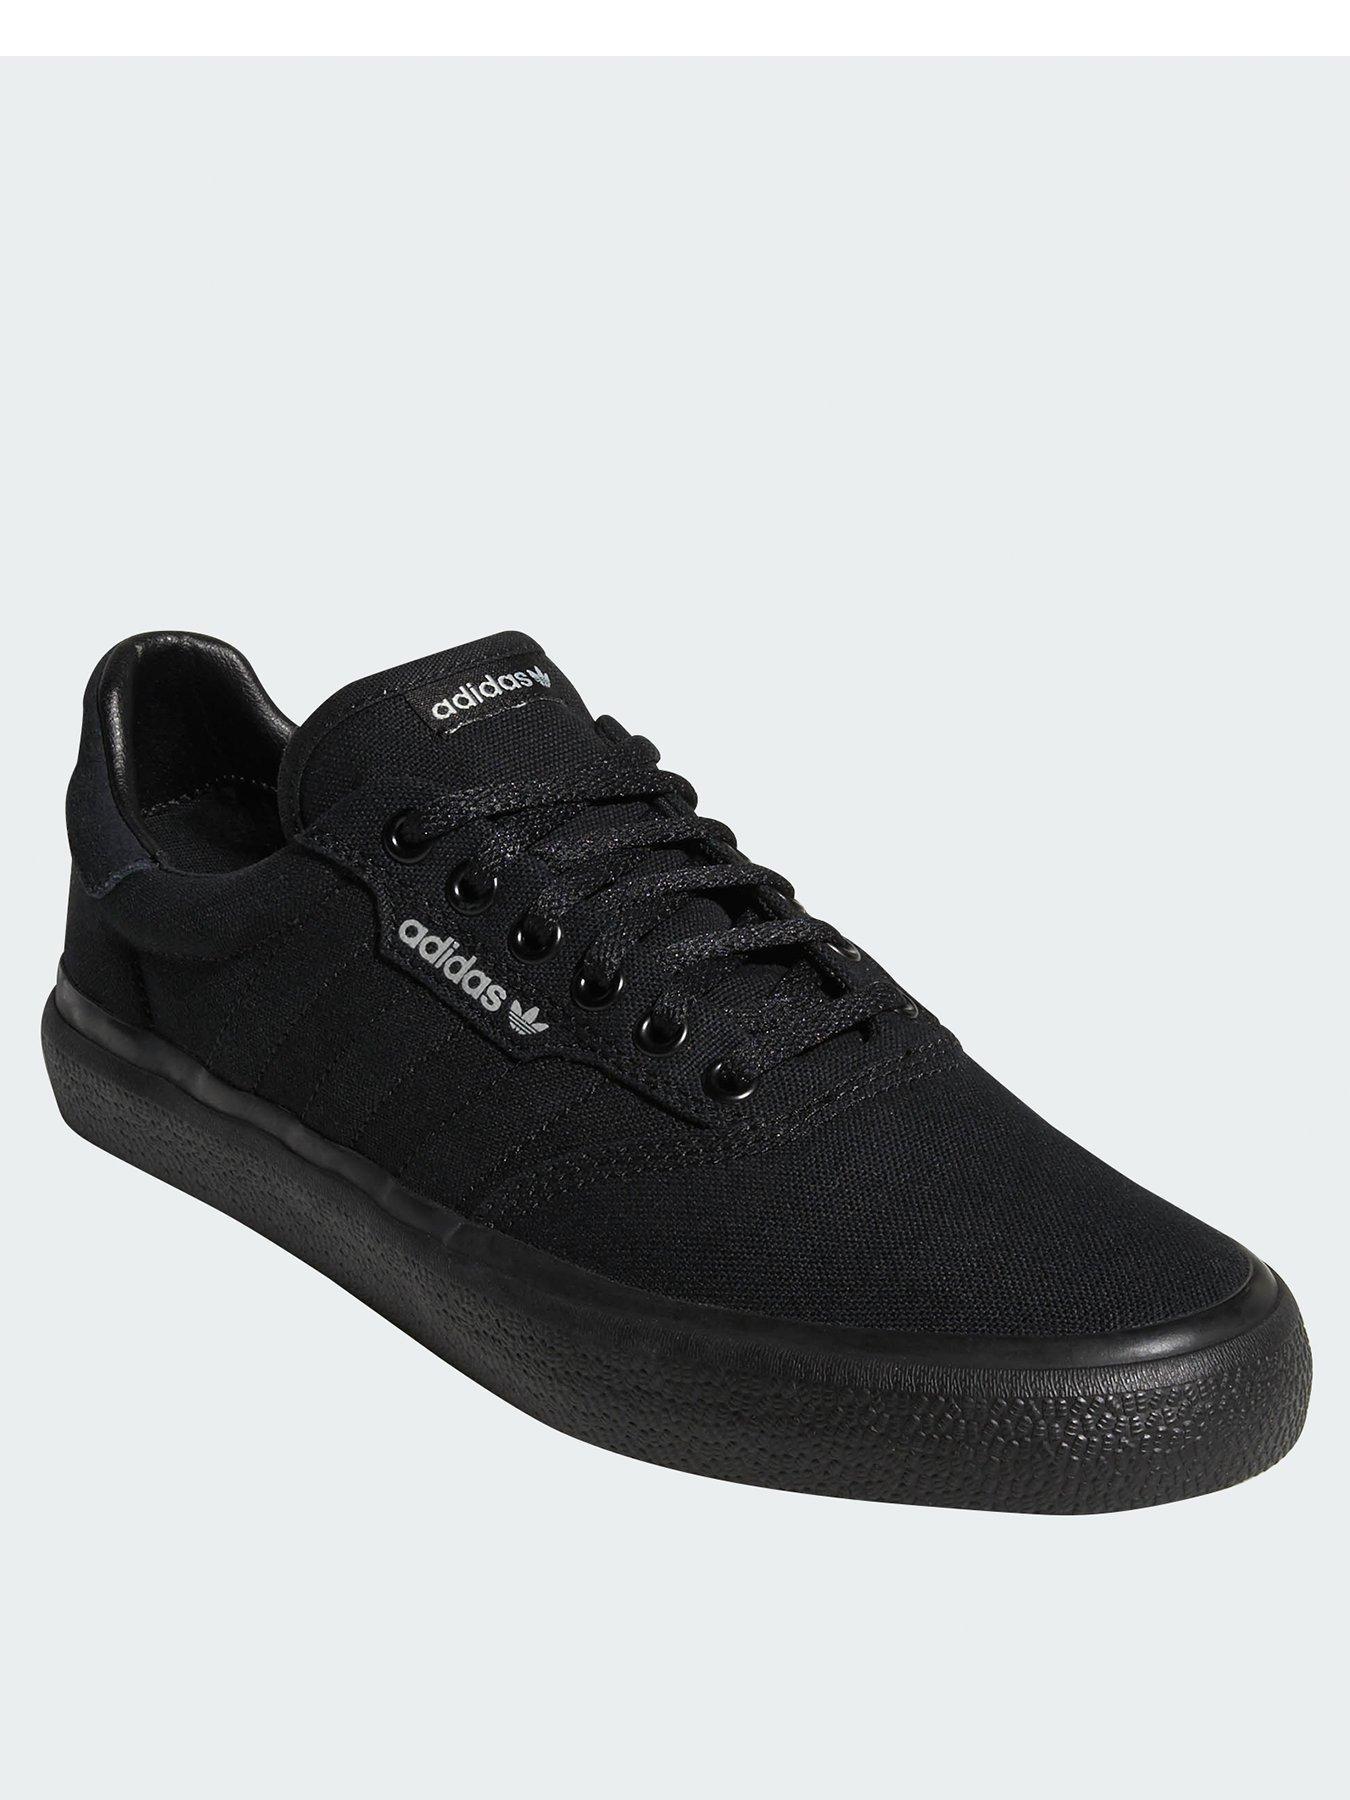 Pumps \u0026 Plimsolls   Adidas originals